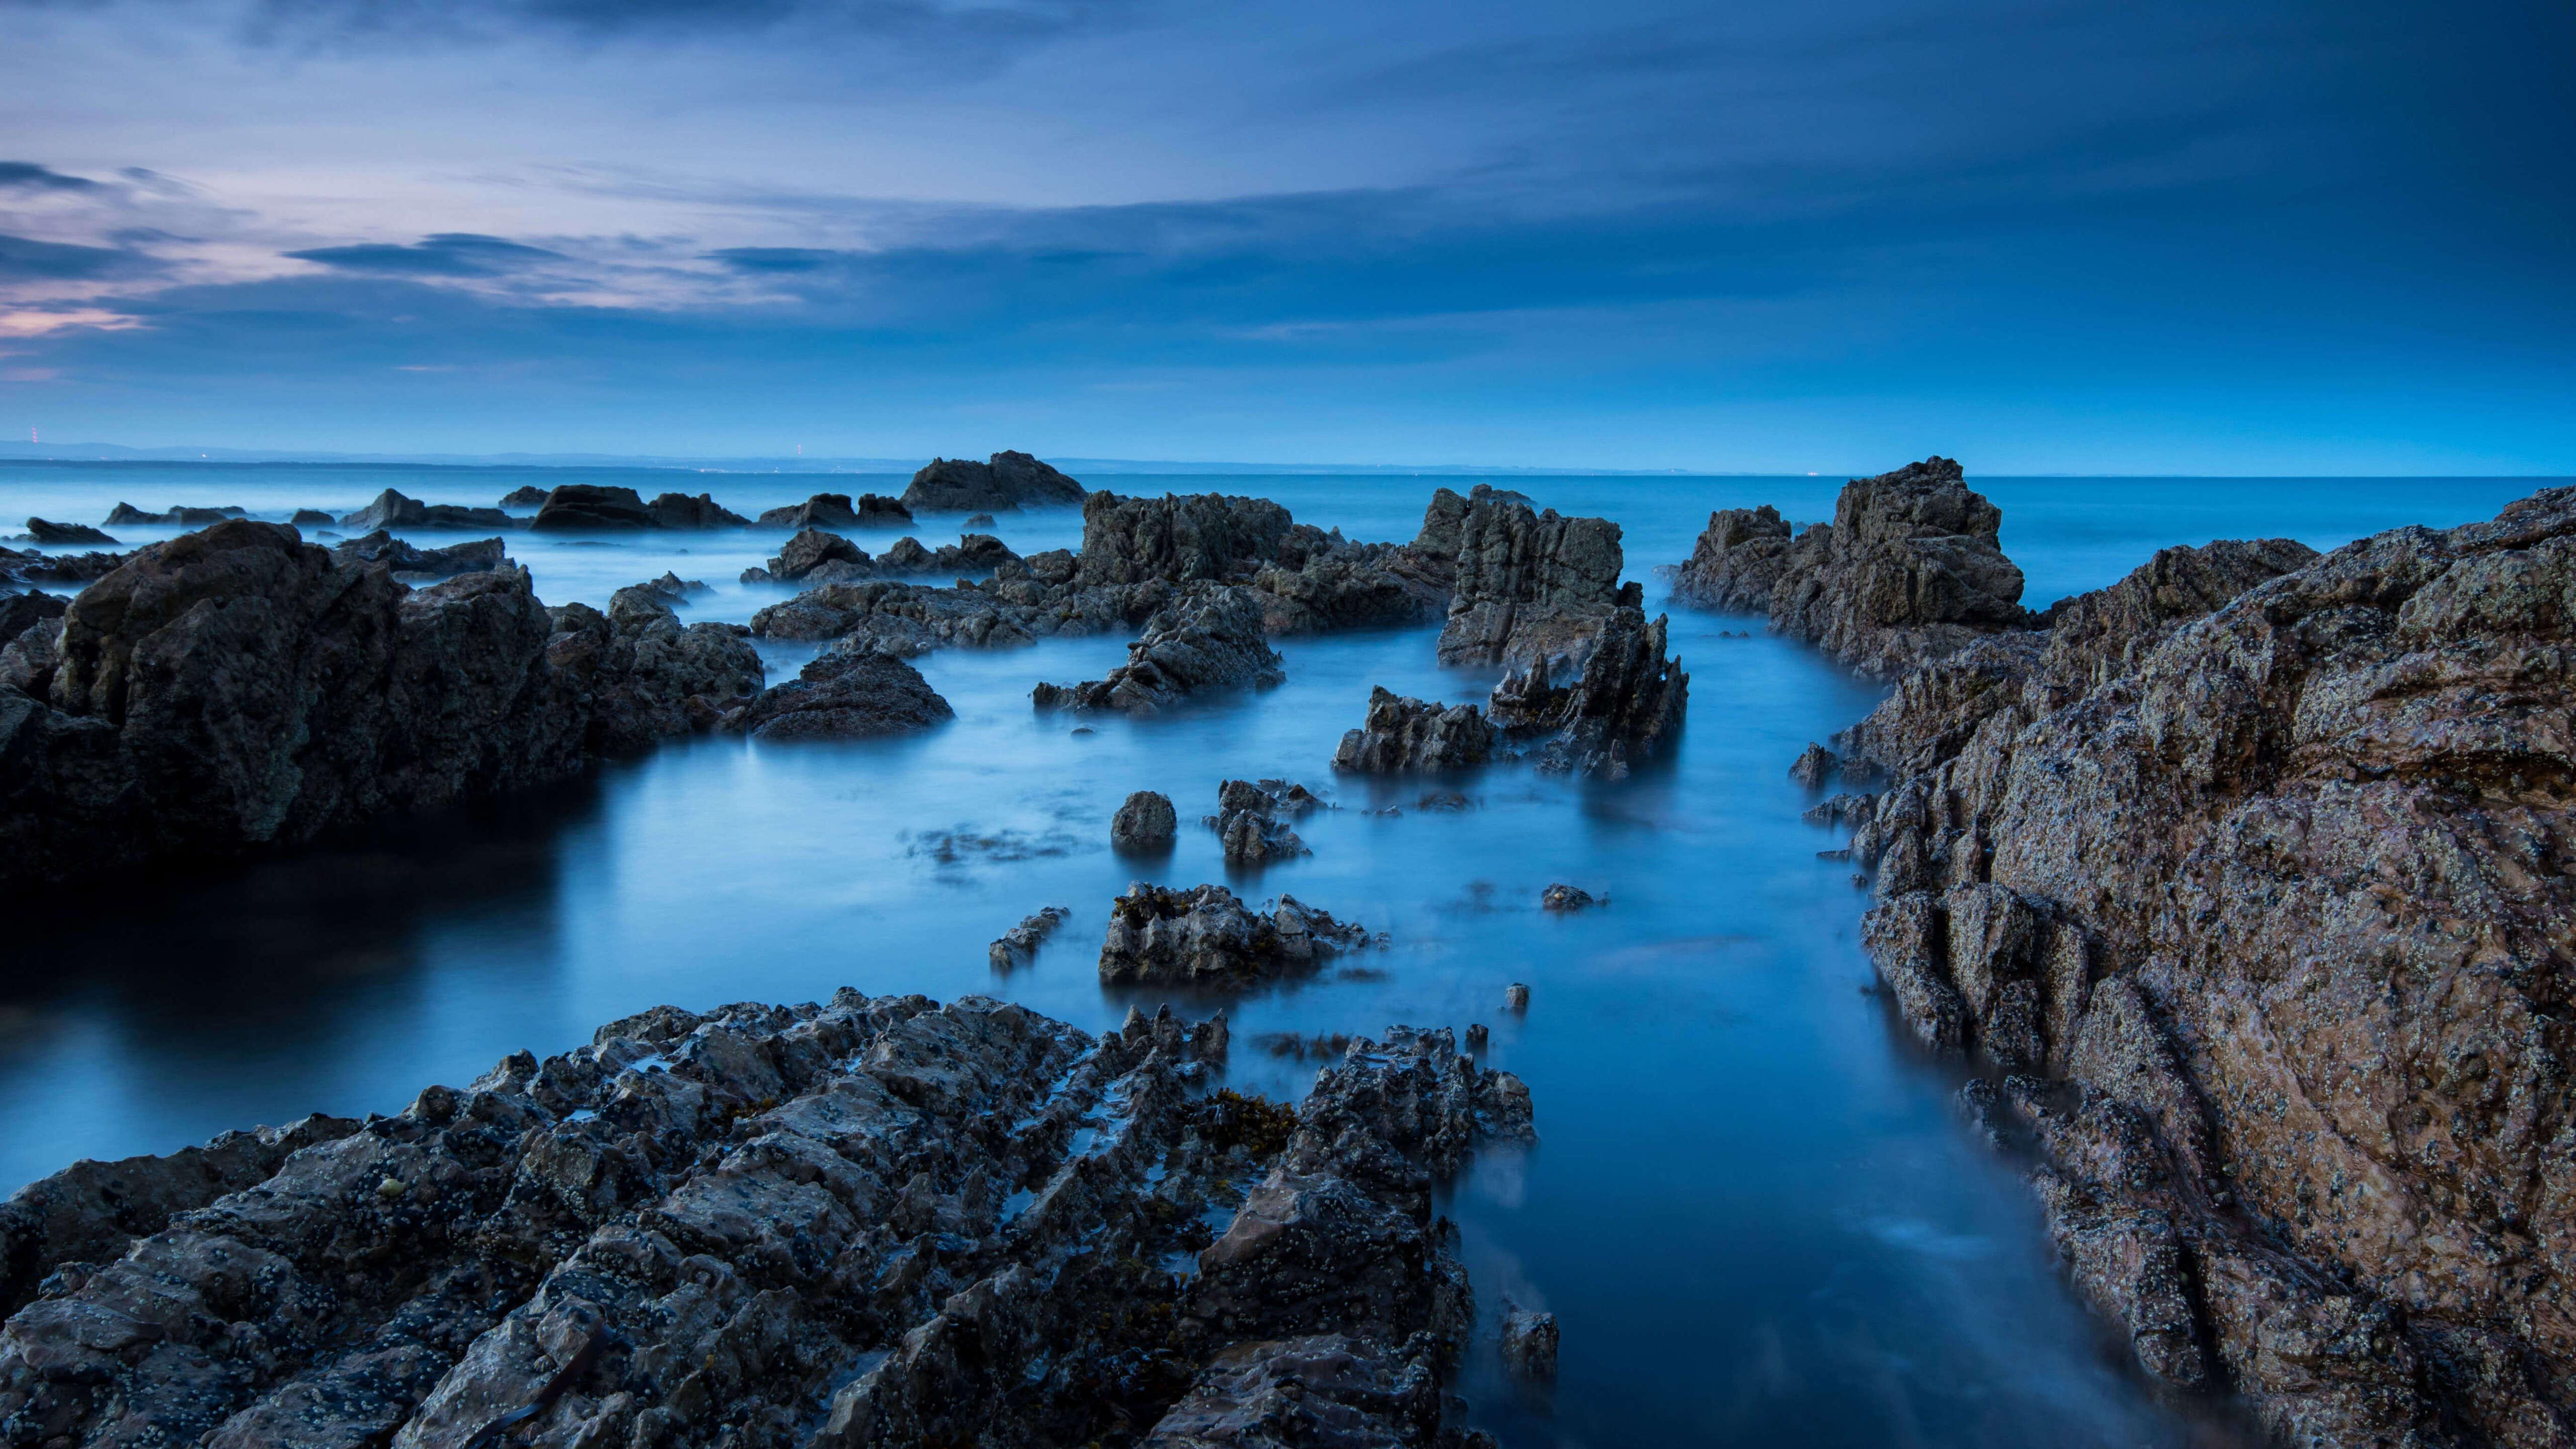 sea-rocks-evening-view-5k-nx.jpg